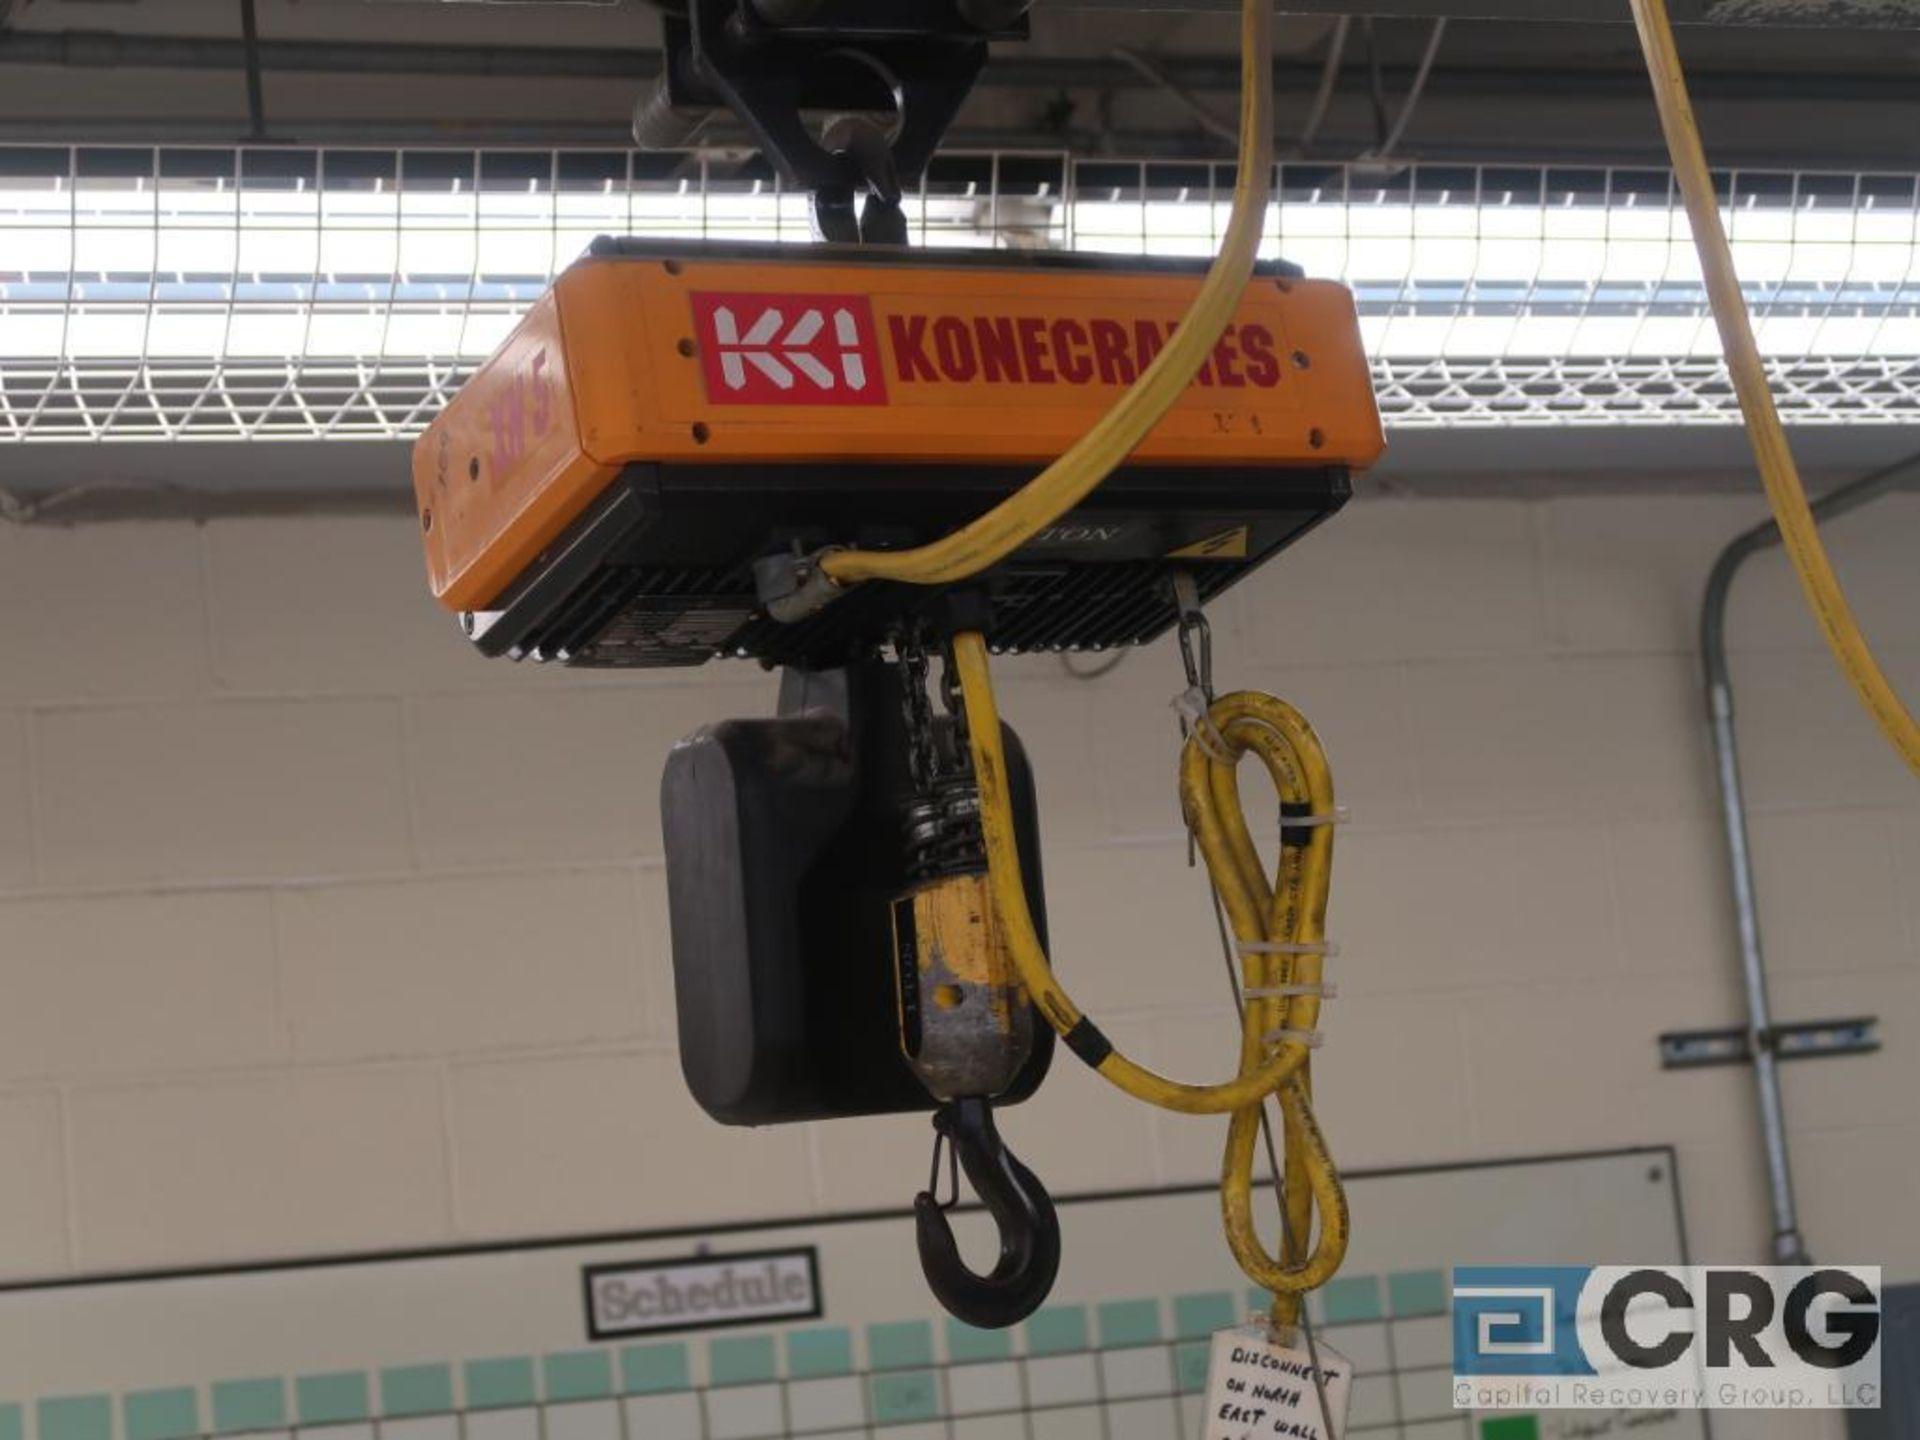 Lot of (2) Konecranes 1 Ton pendant electric chain hoists (Dandy Room) - Image 2 of 3